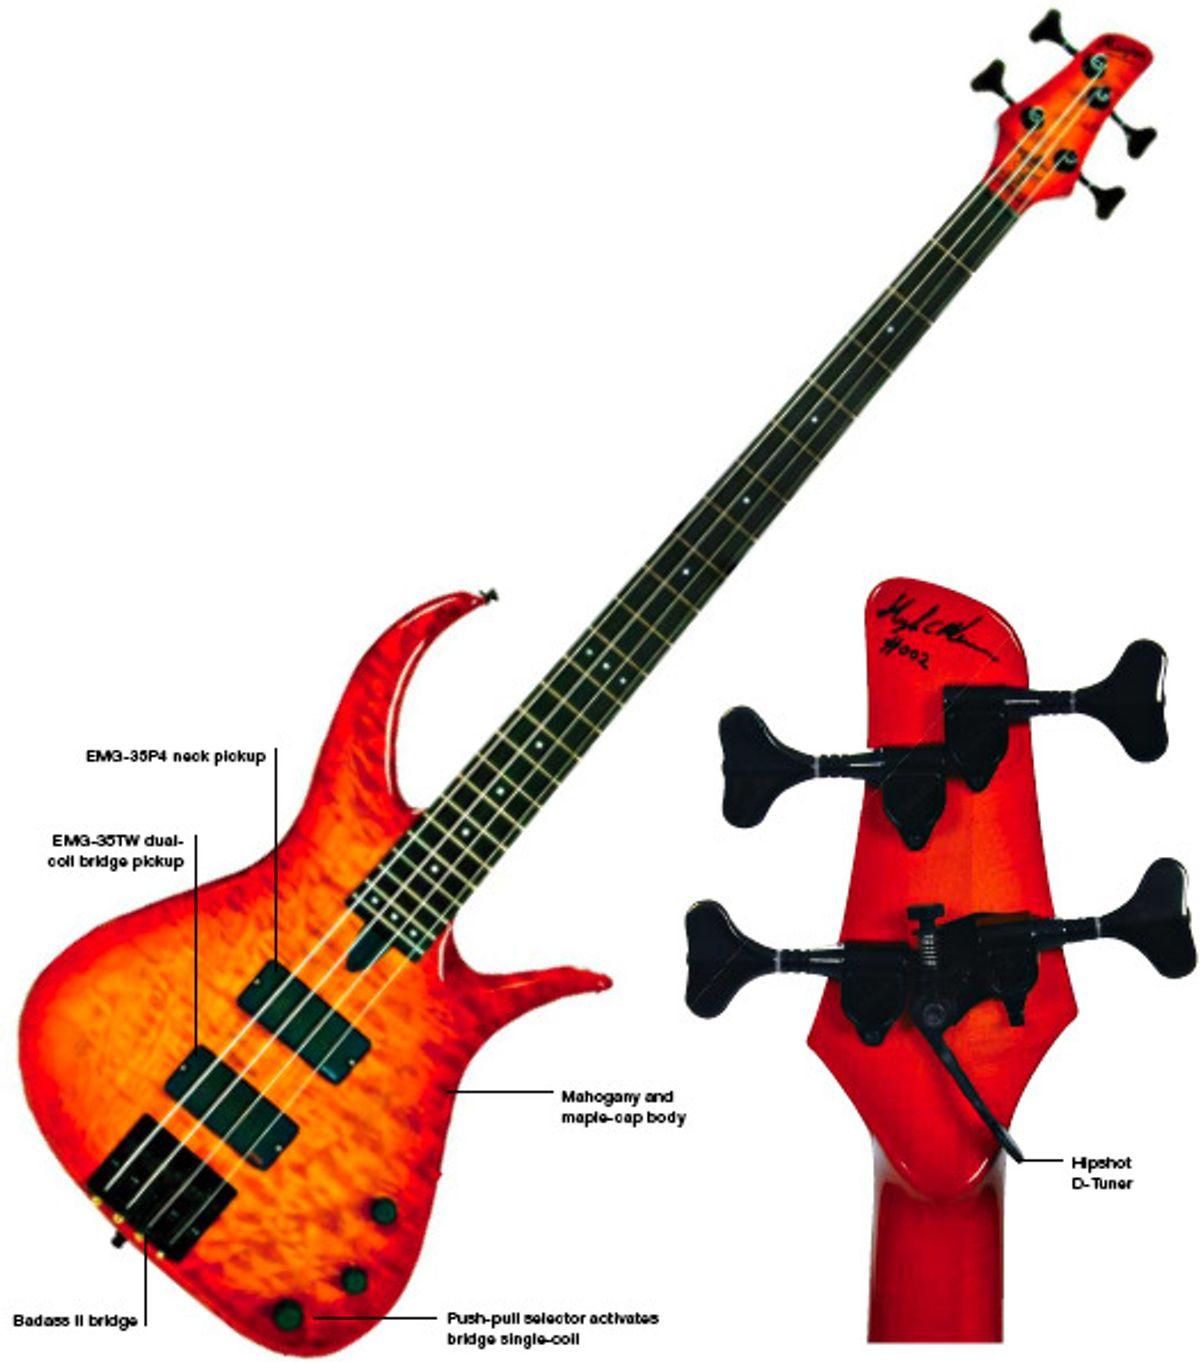 Manson Guitars E-bass John Paul Jones Signature Bass Review